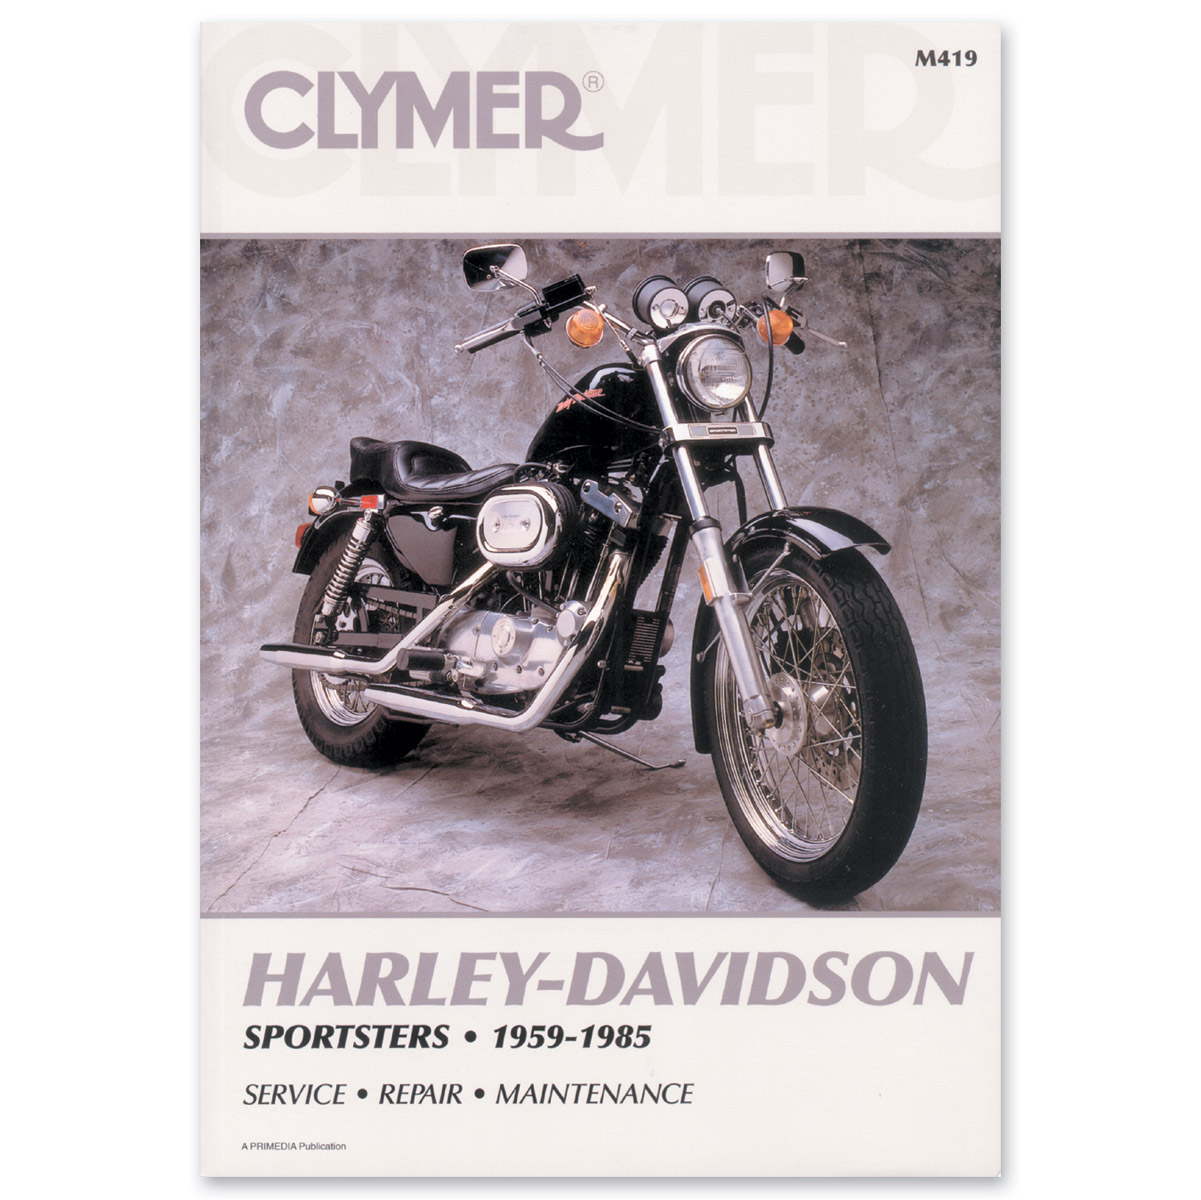 Clymer Sportster Repair Manual